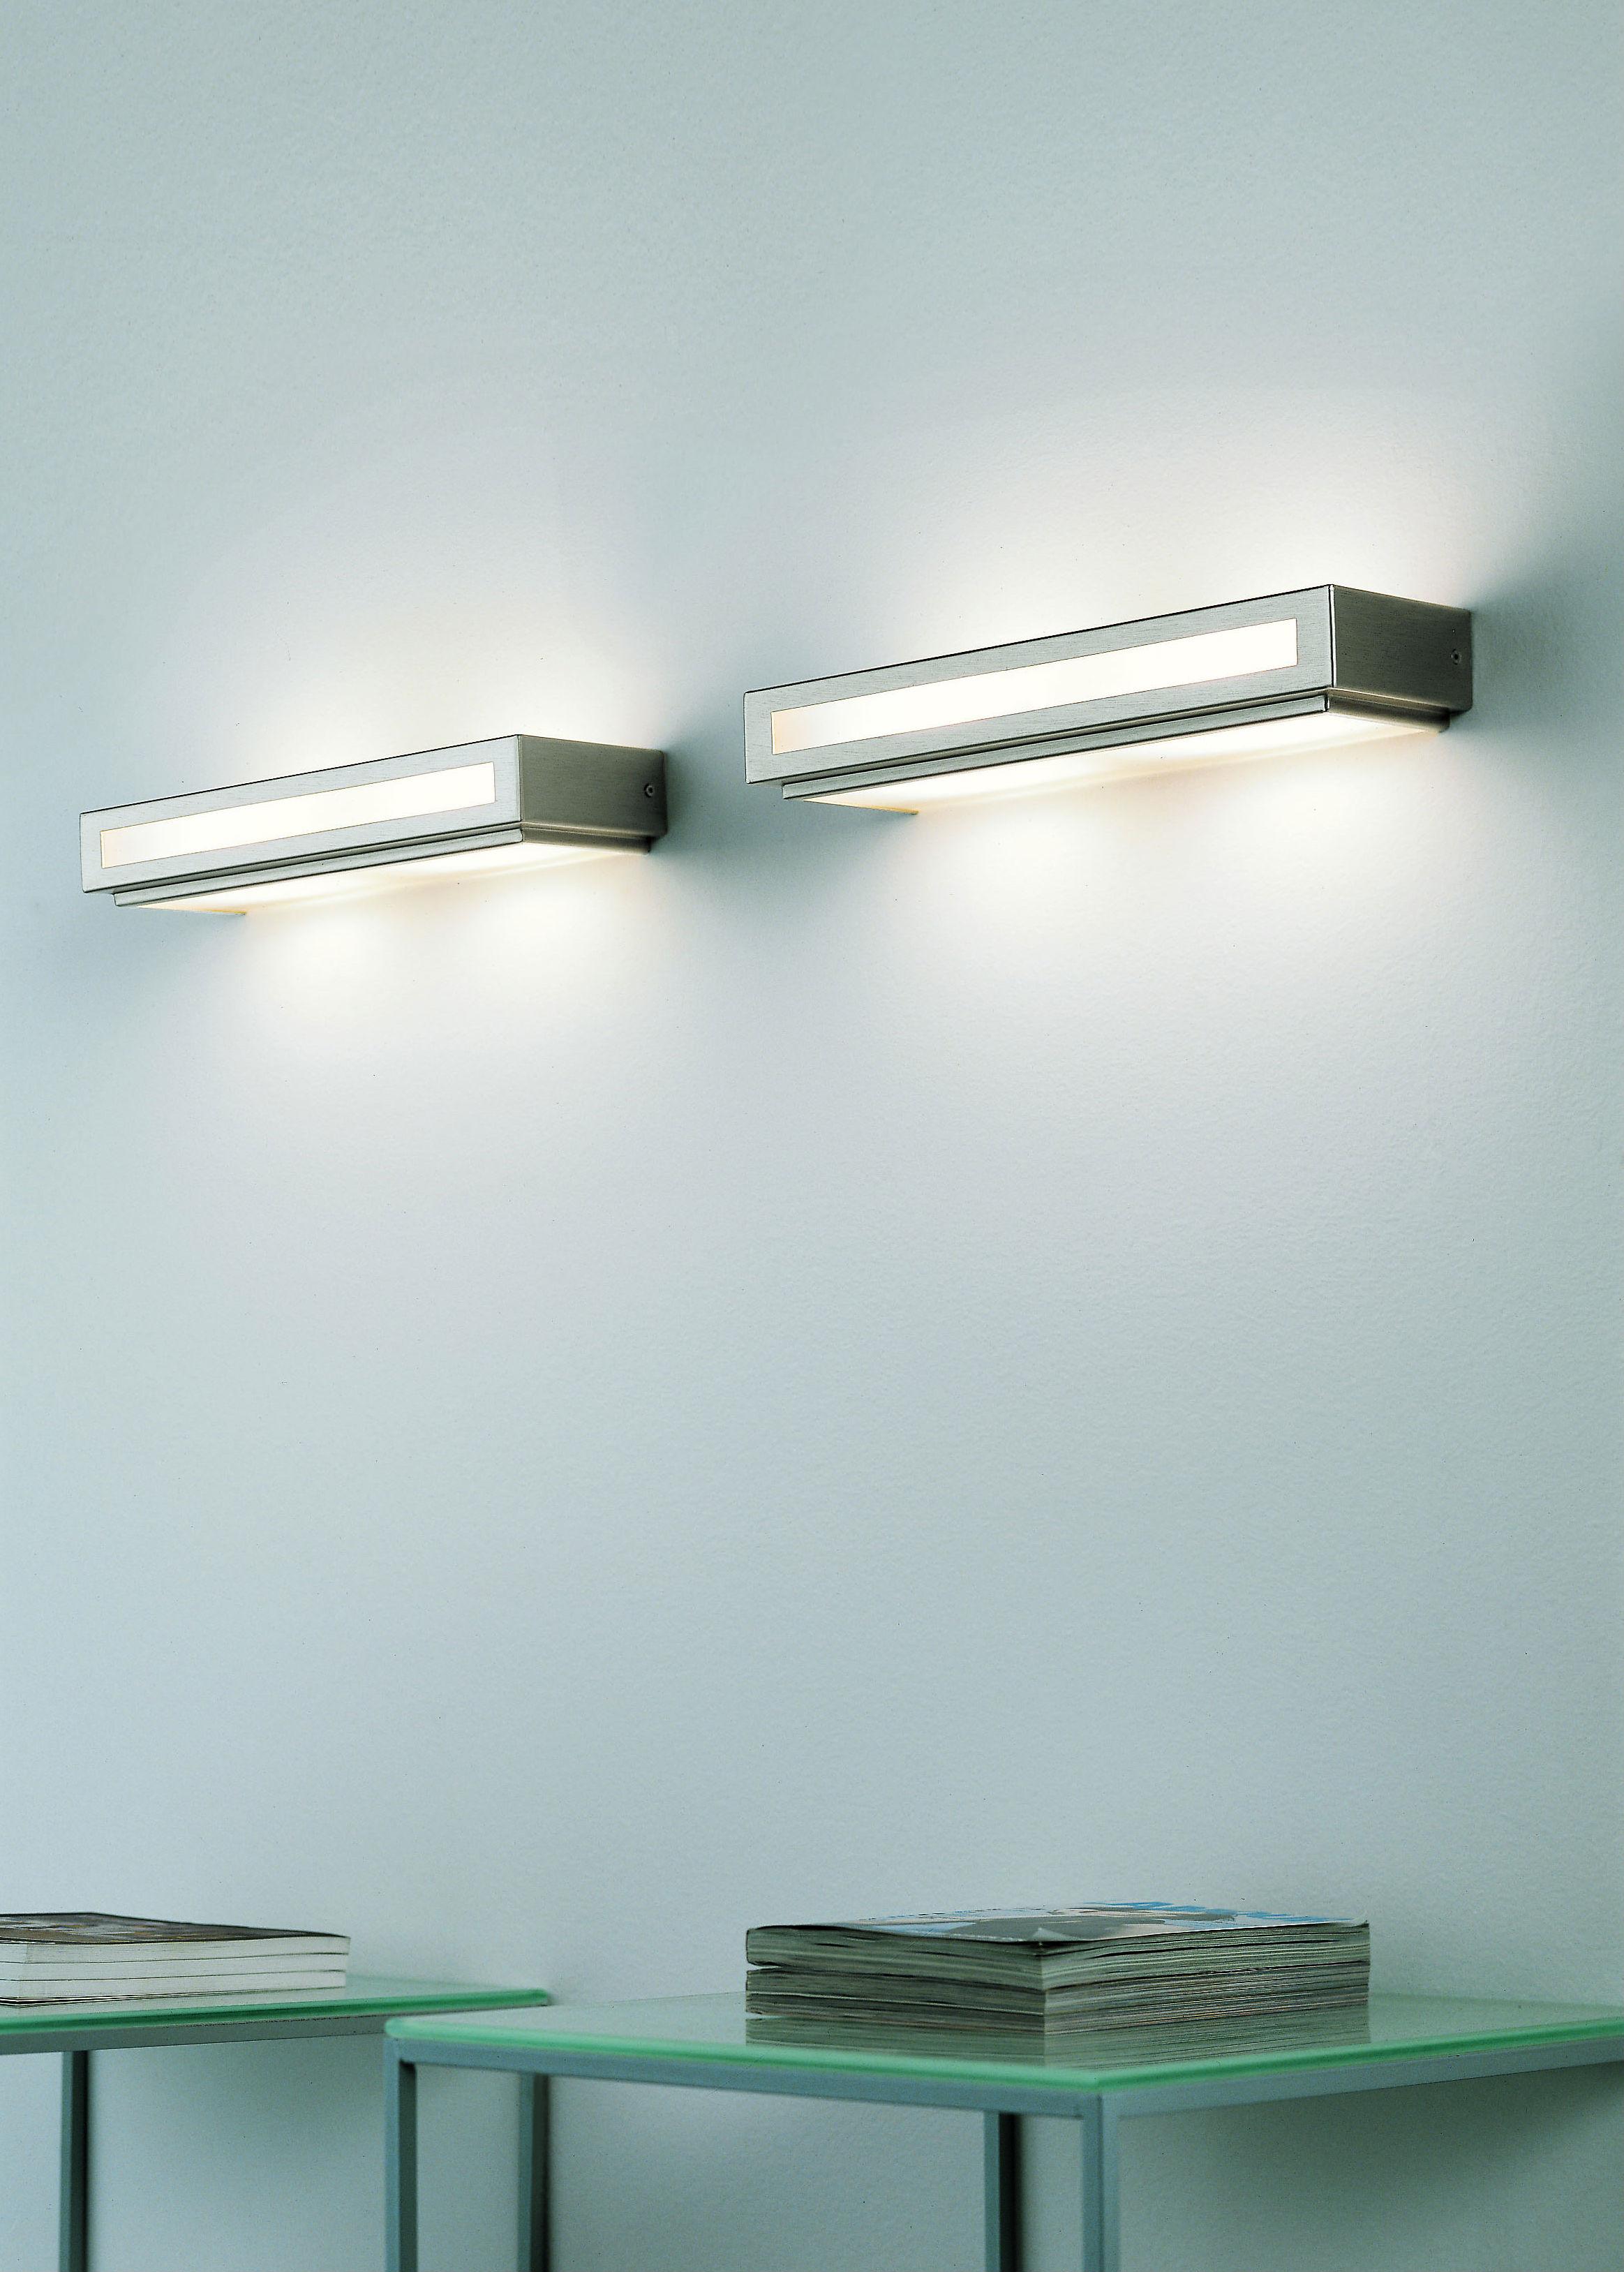 Lampada parete TOWN BIG LED cromo | 10 watt R7s 35x4cm